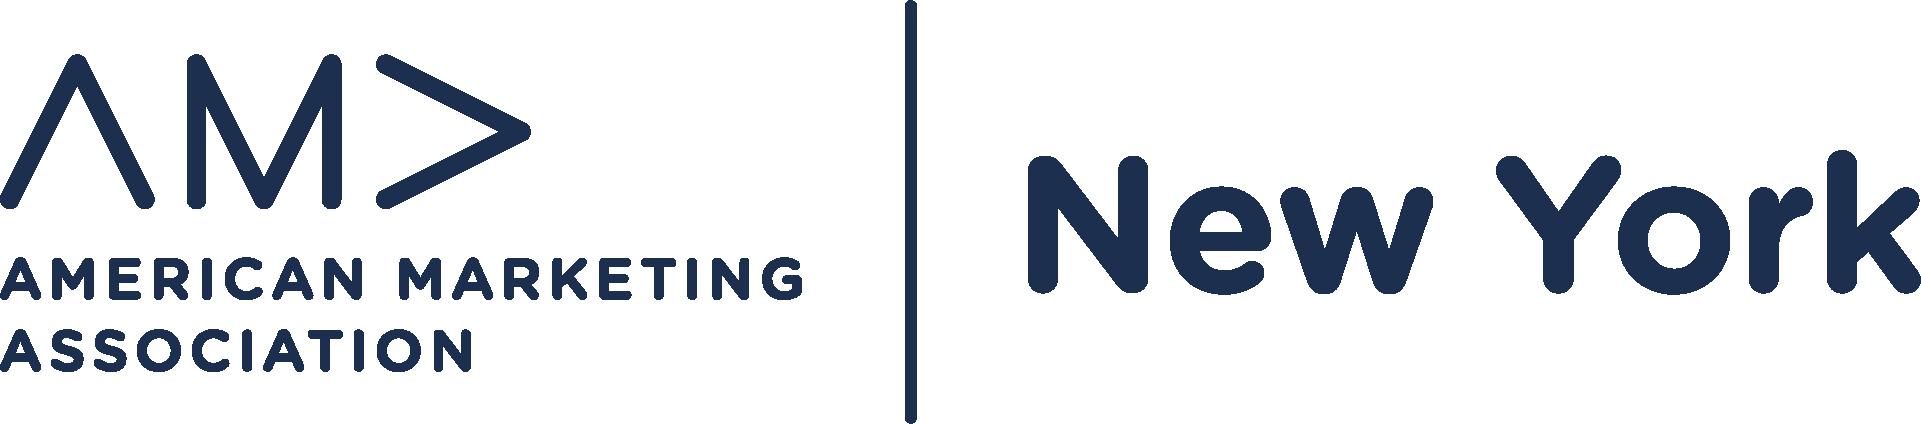 Logo-2-AMA-American-Marketing-Association-next-to-Chapter__Blue-CMYK-500dpi.png